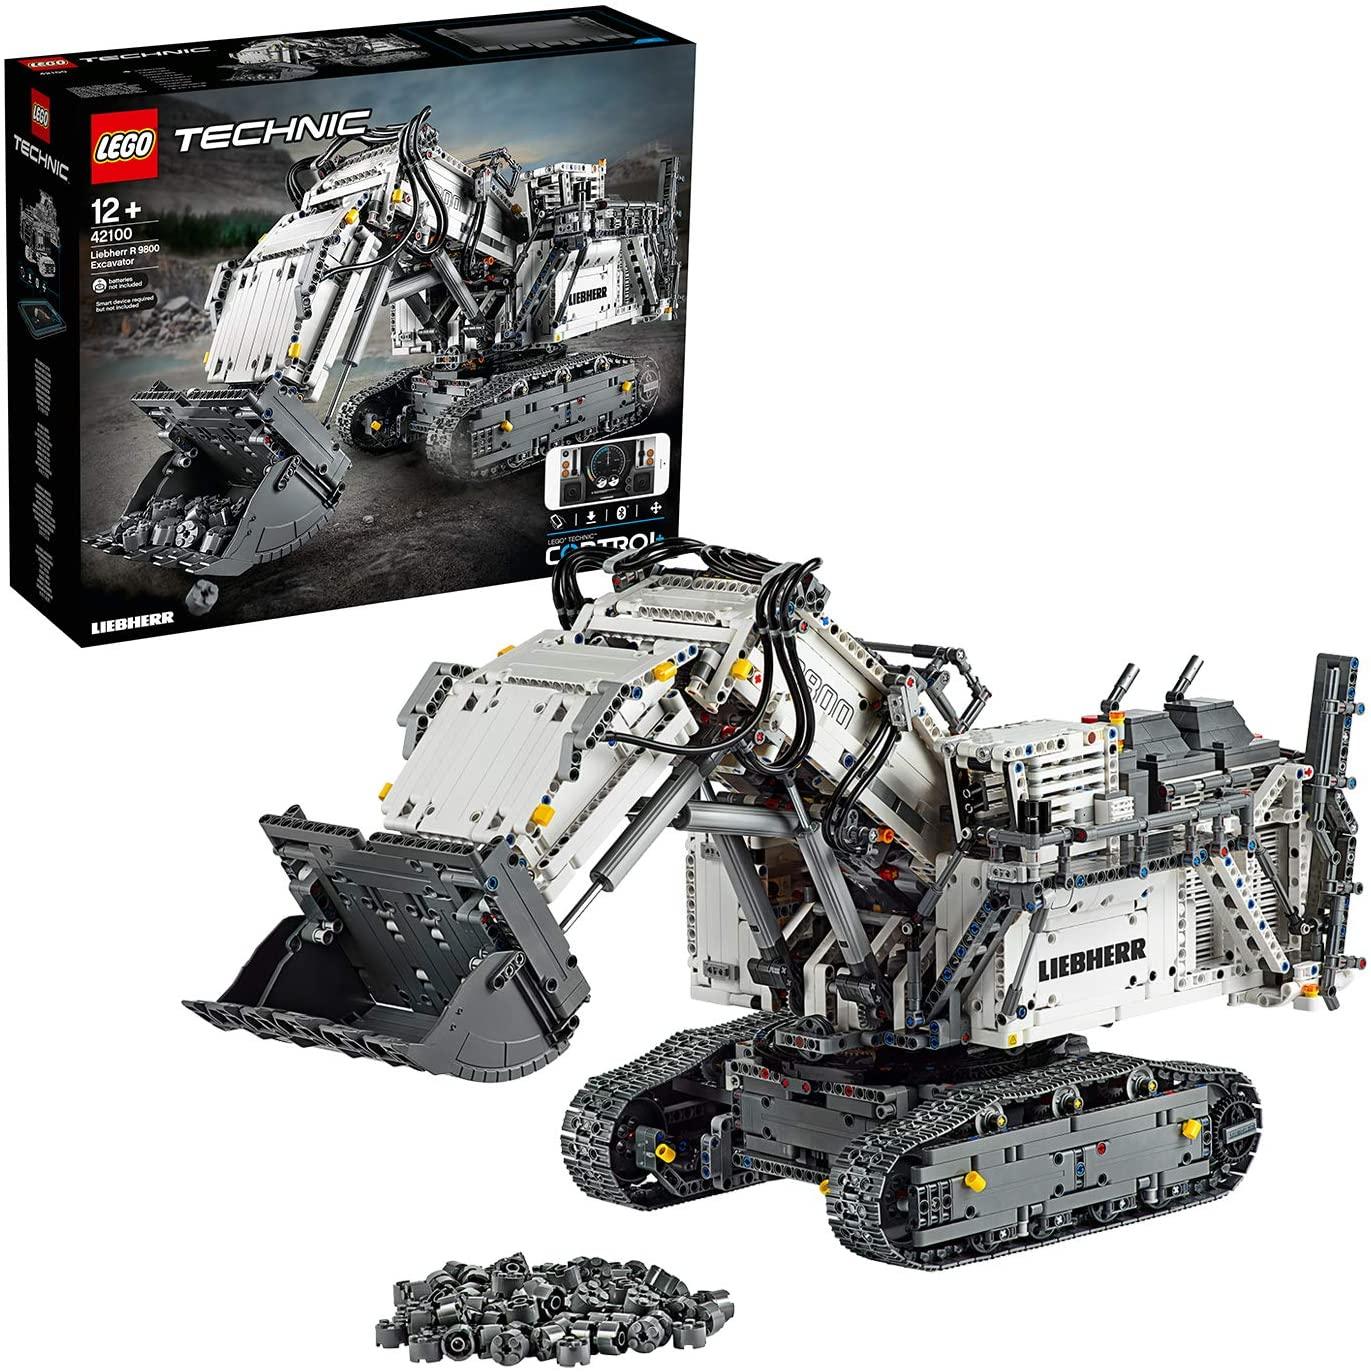 LEGO 42100 Technic Control+ Liebherr R 9800 Excavator App Controlled Advanced Construction Set £299.99 @ Amazon